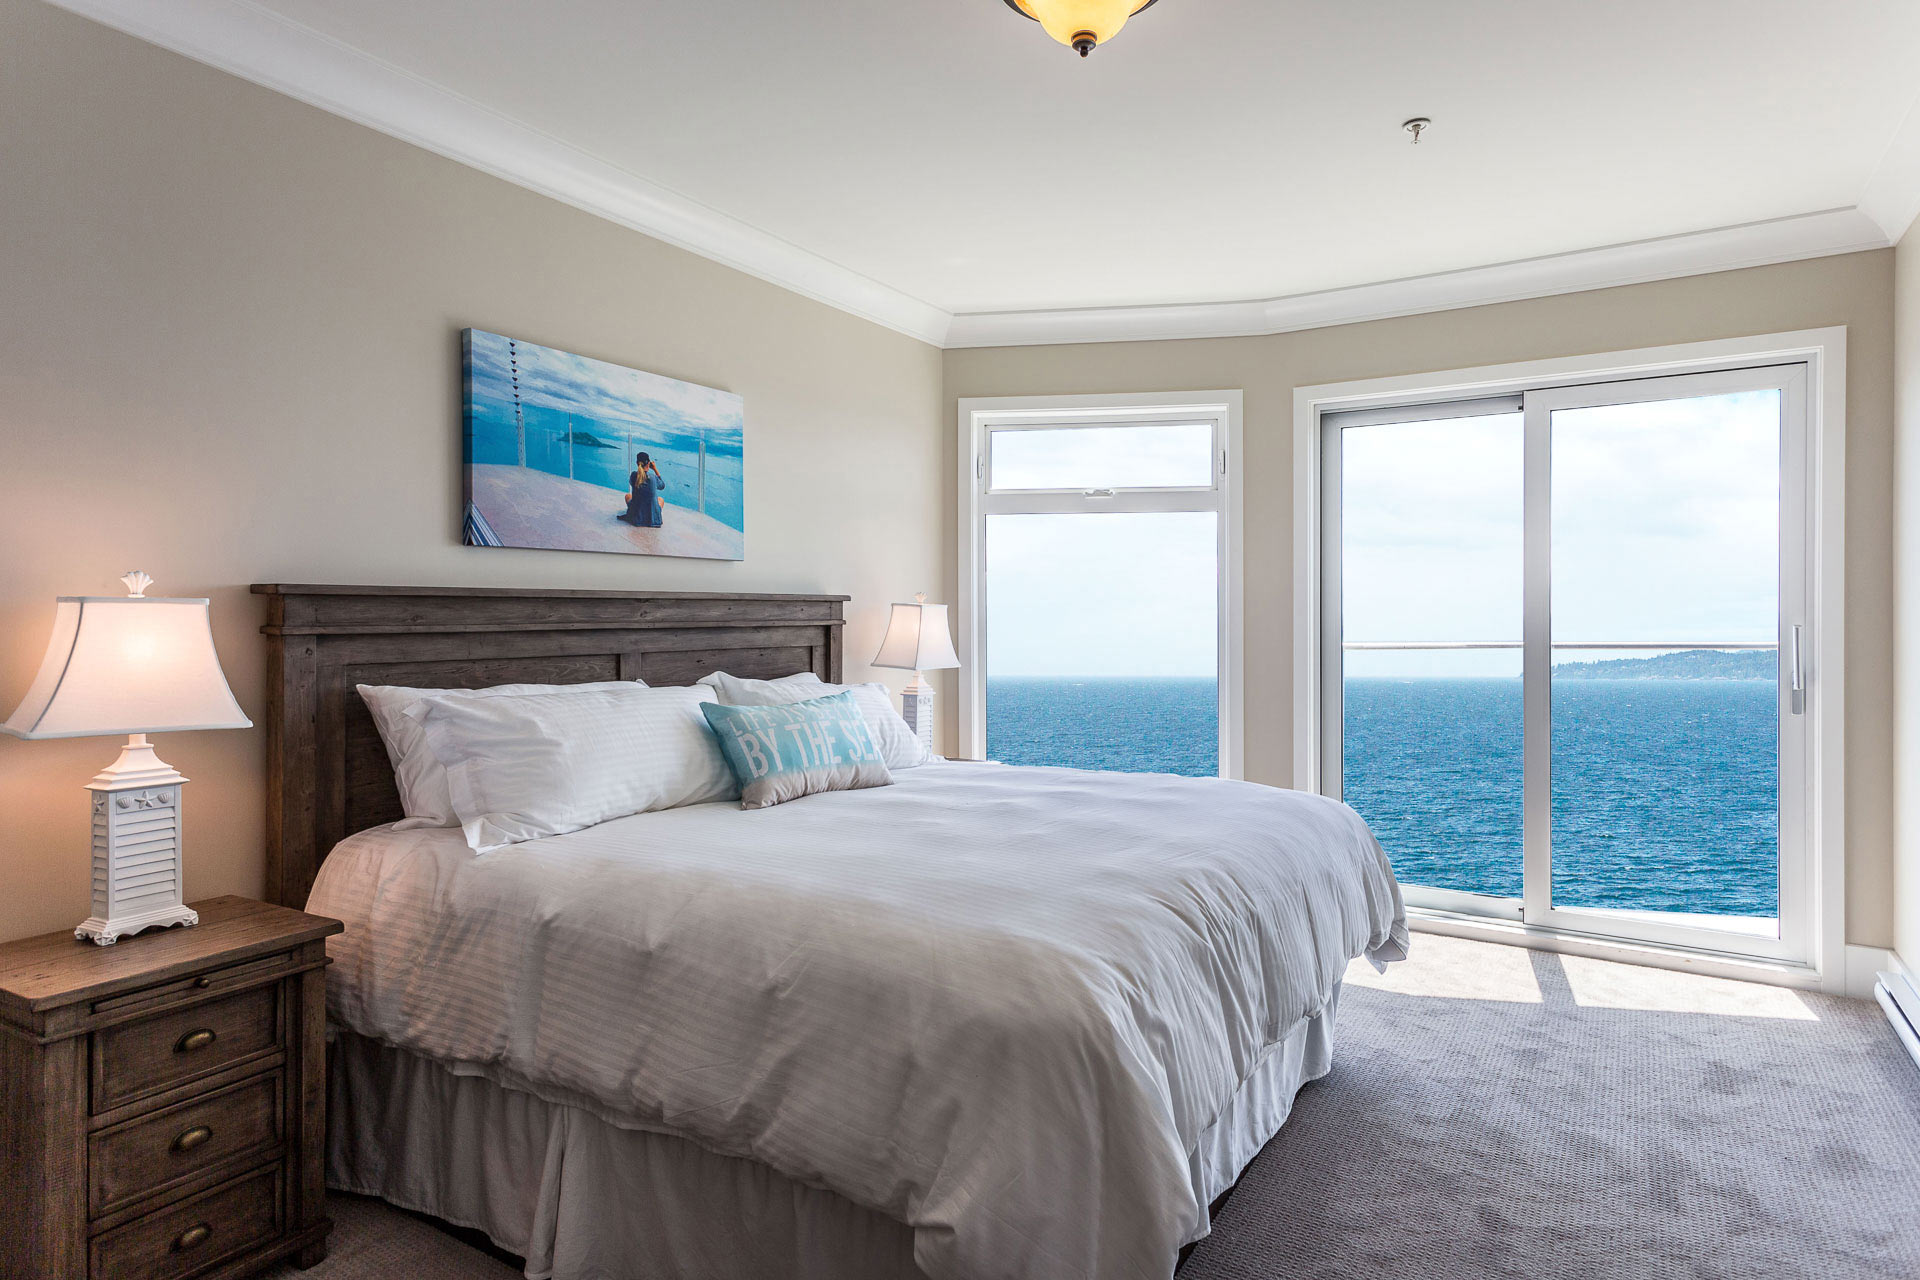 sooke point ocean cottage resort accommodations 2 bedroom plus den